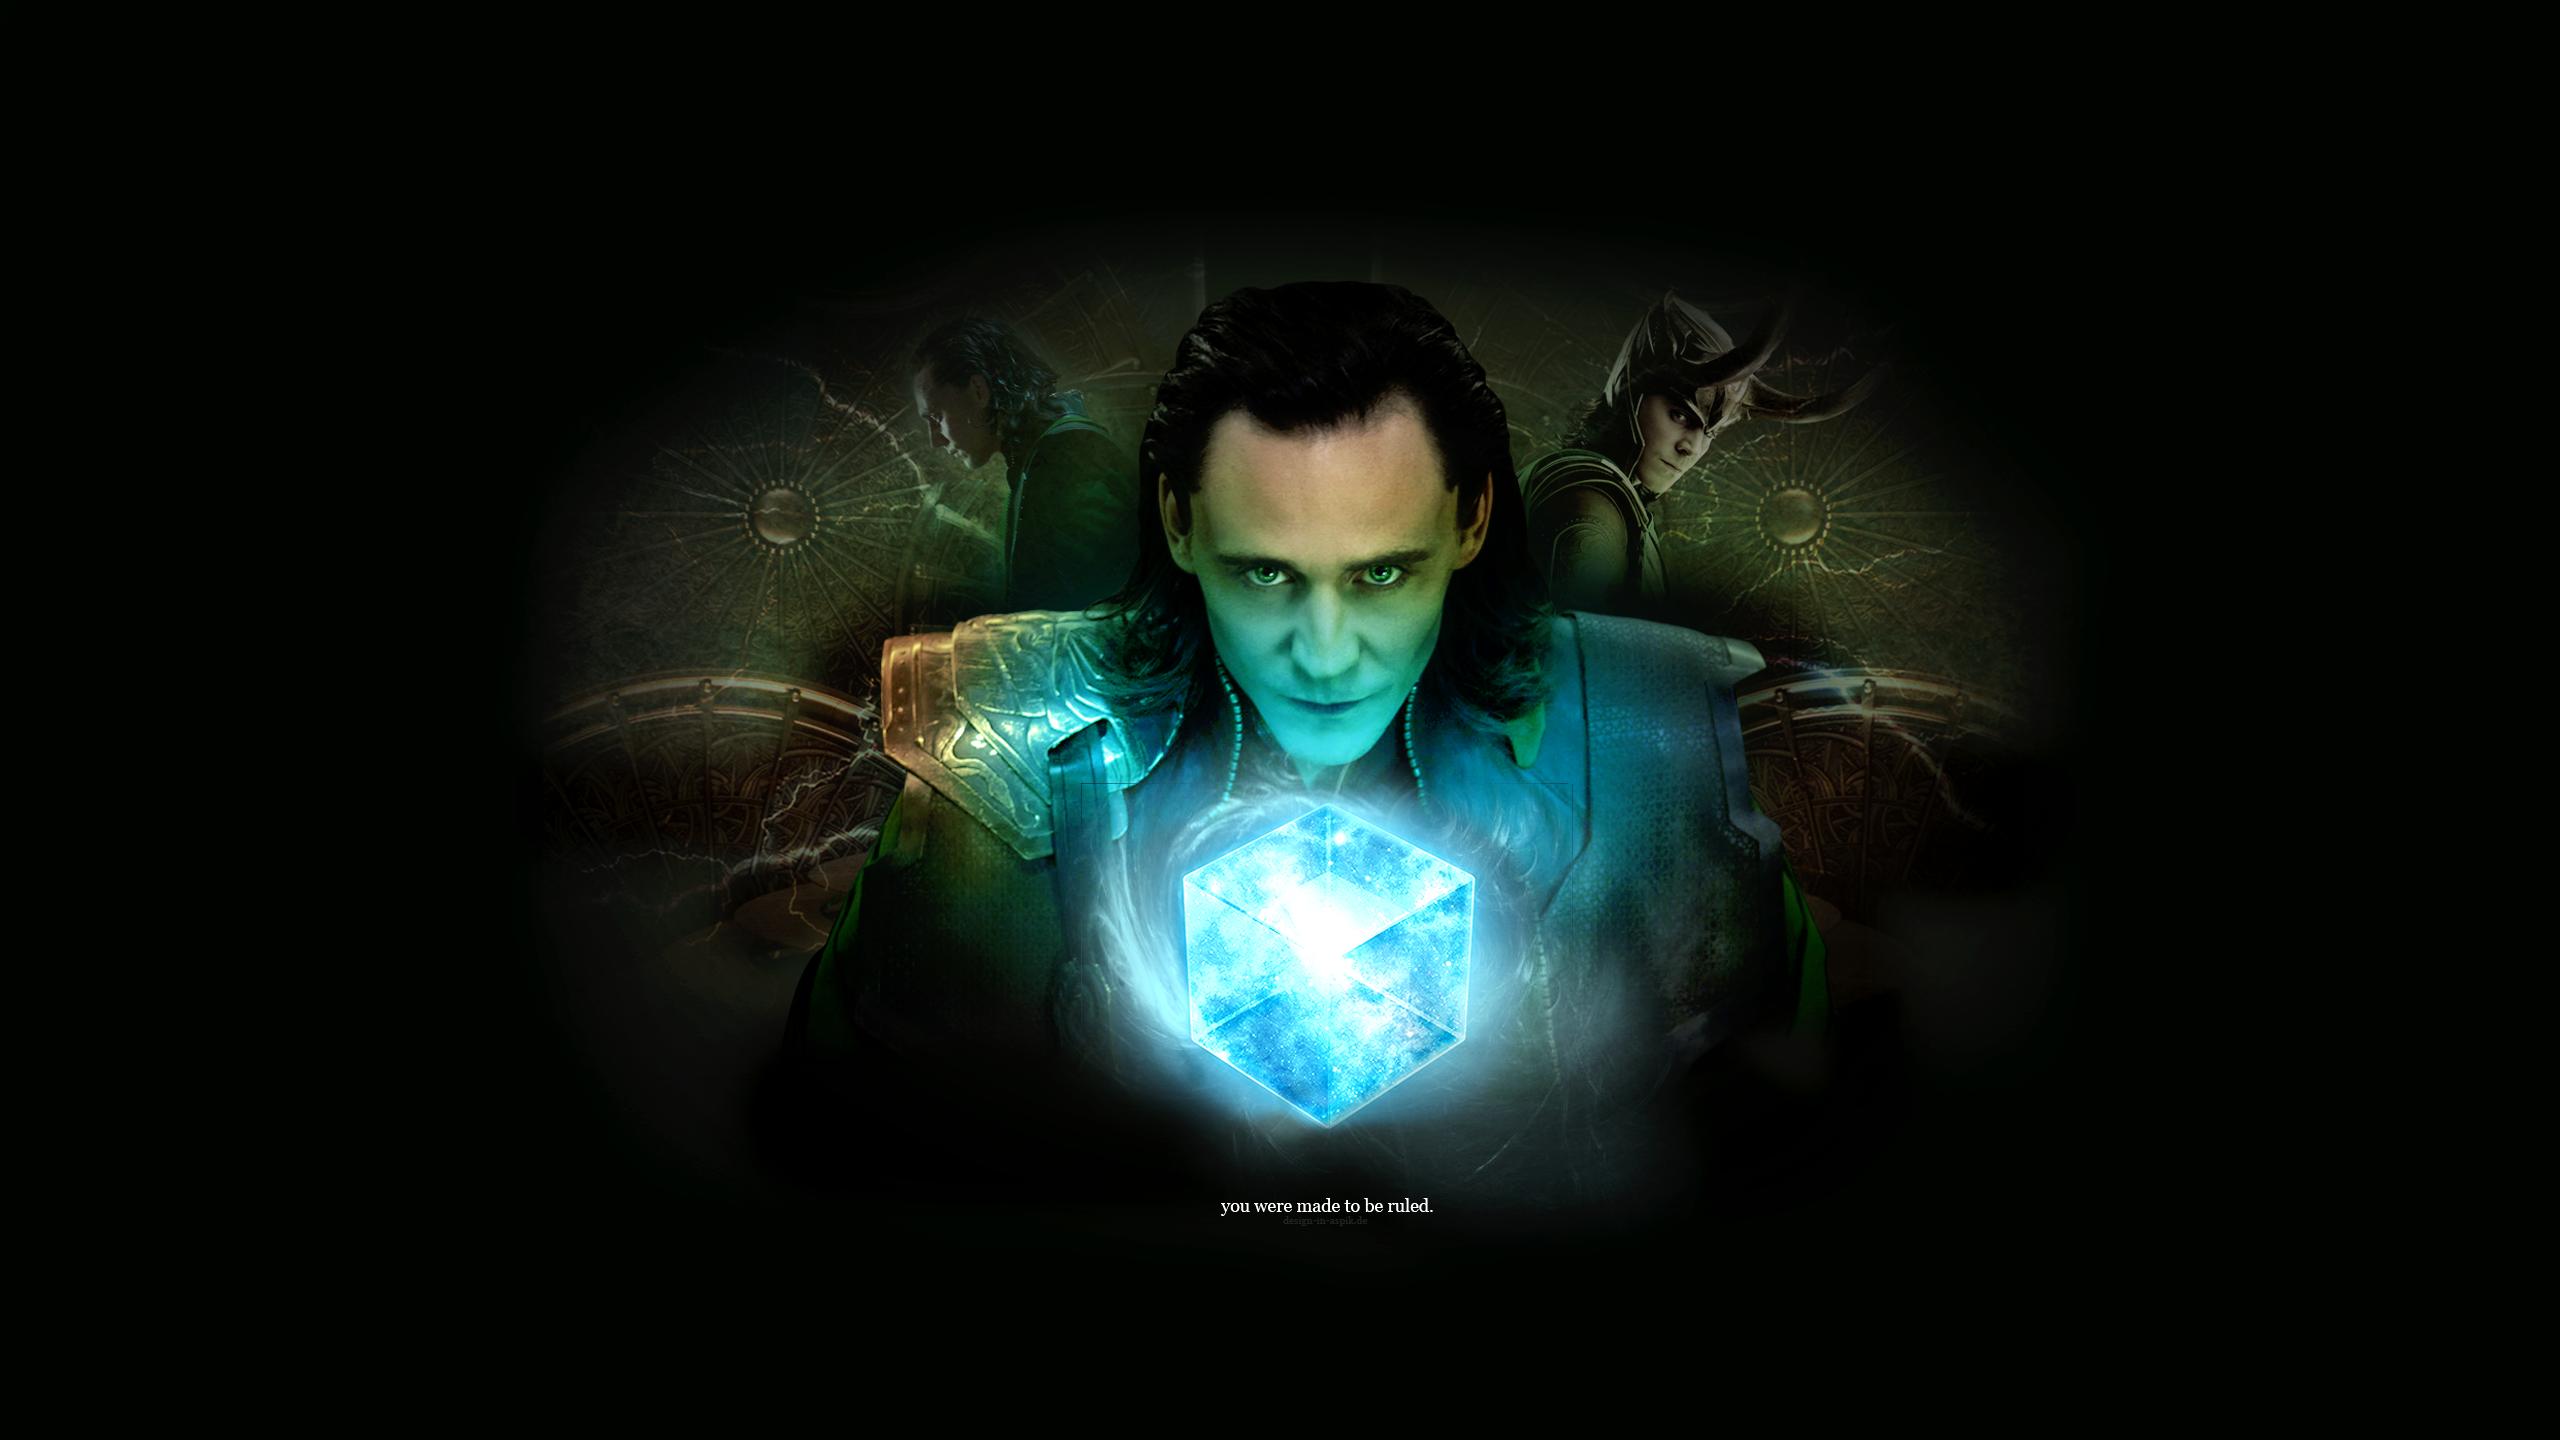 Loki Tom 25601440 Wallpaper 2110072 2560x1440